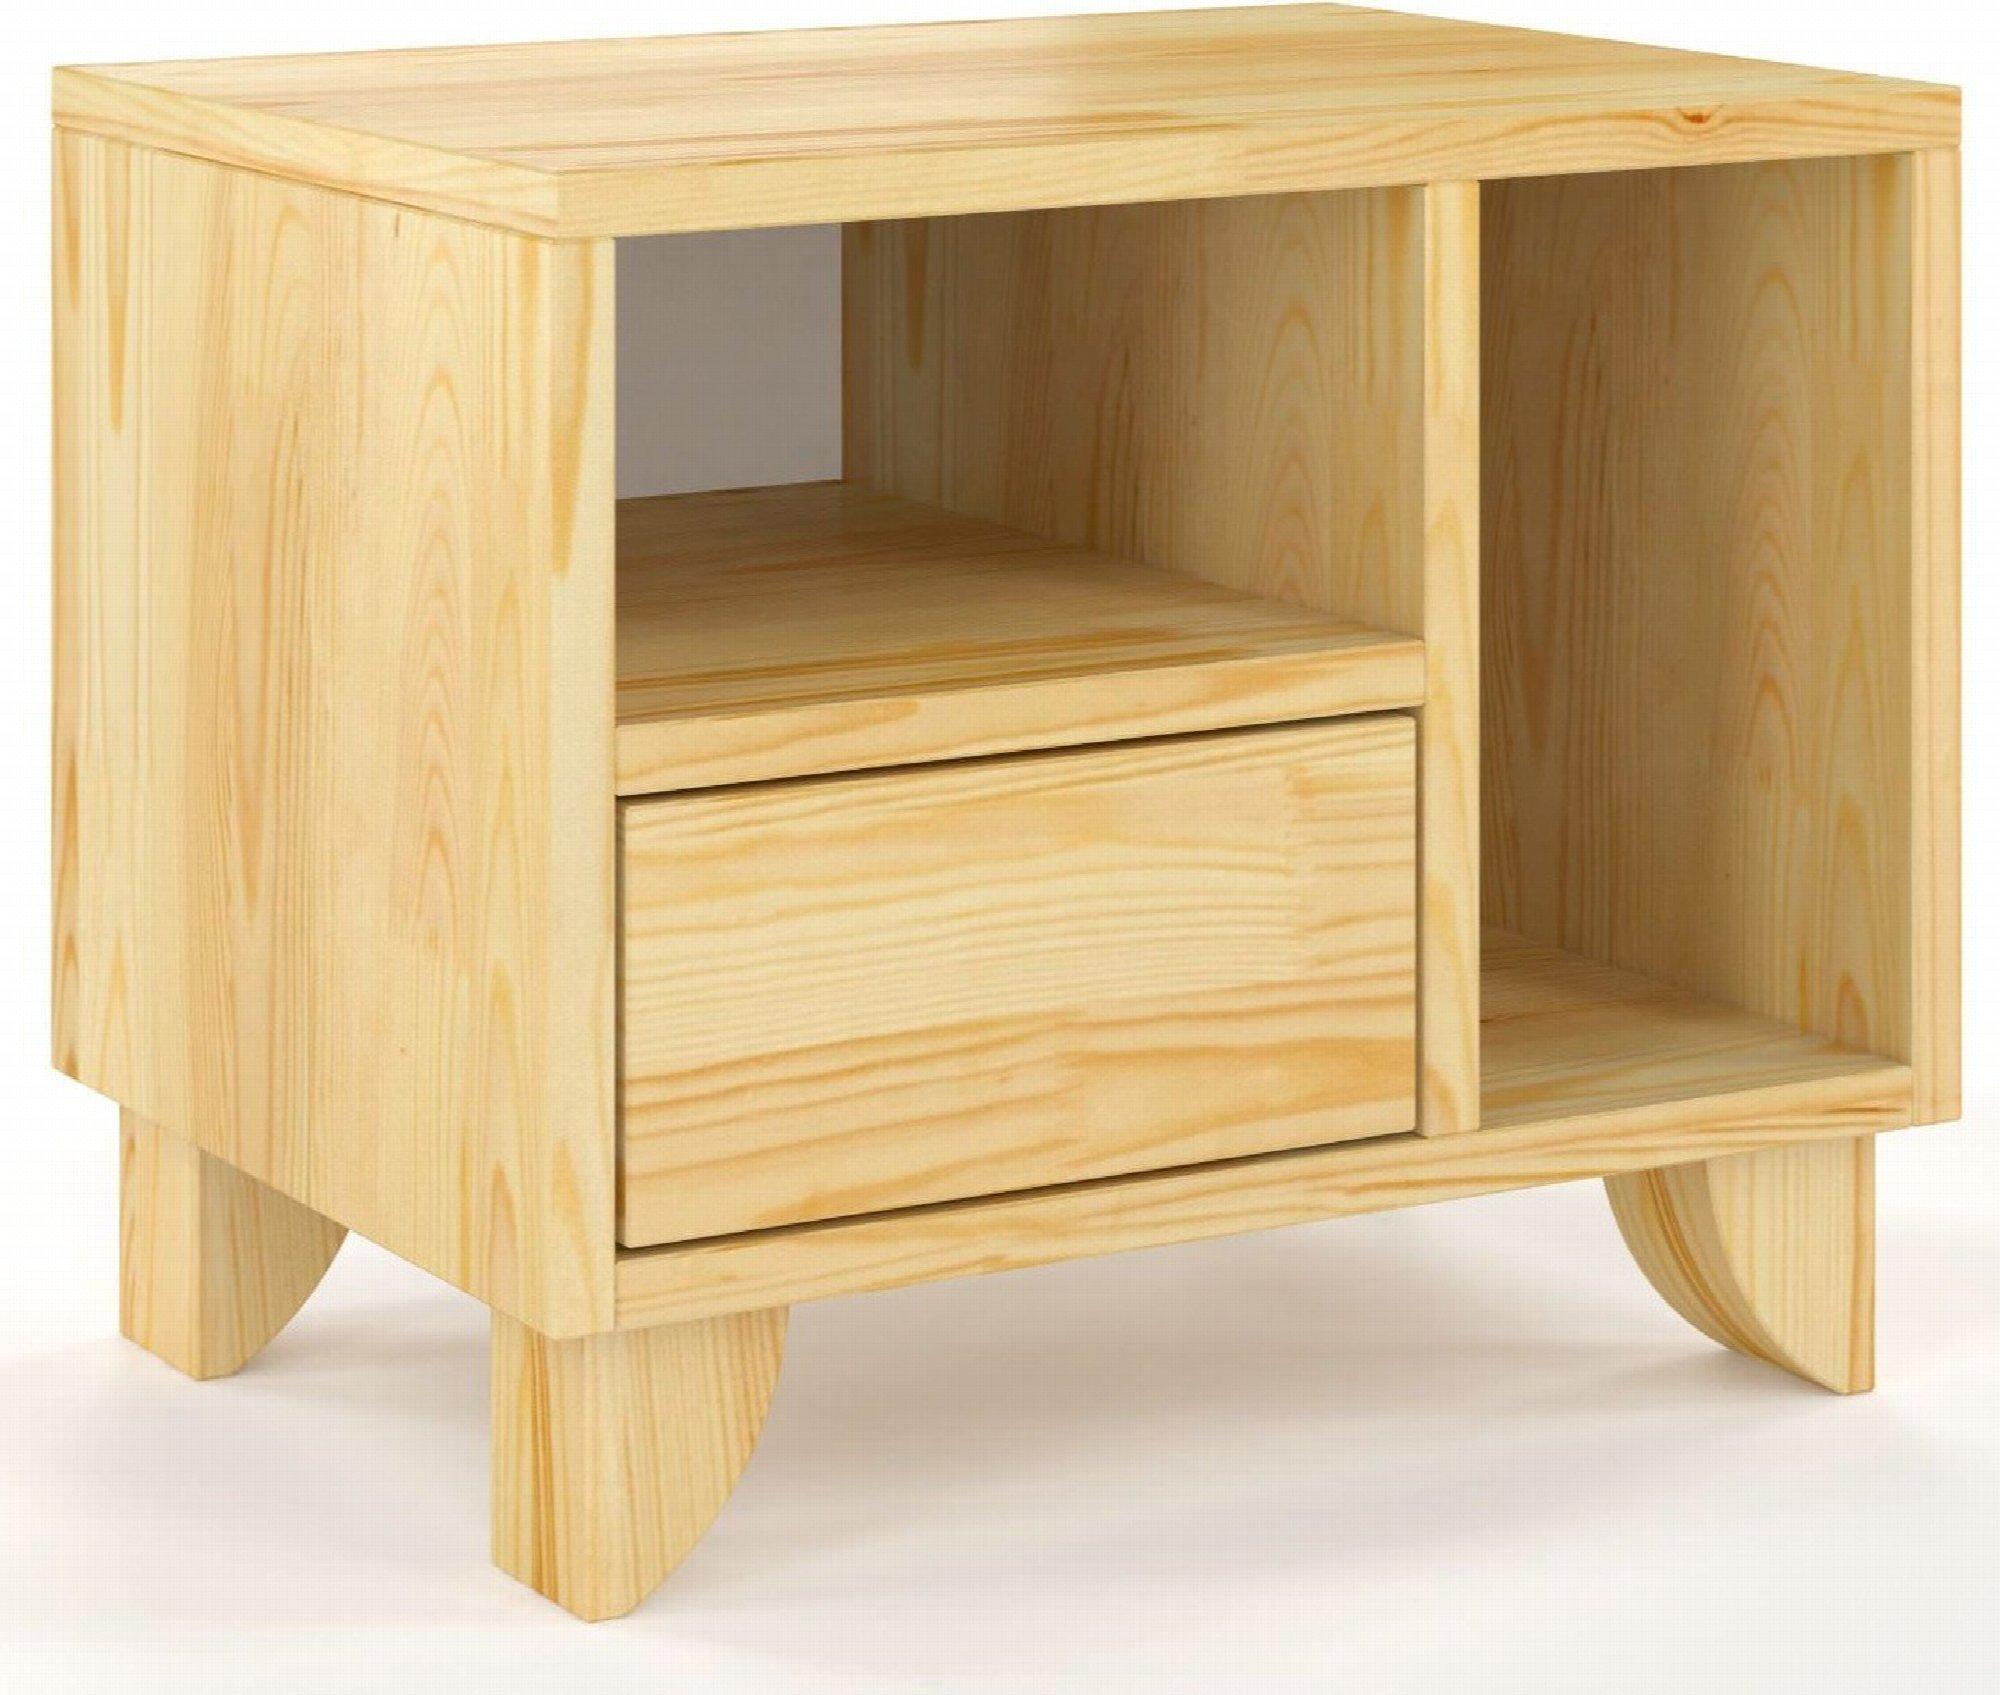 Table de chevet 2 niches 1 tiroir en pin massif bois clair